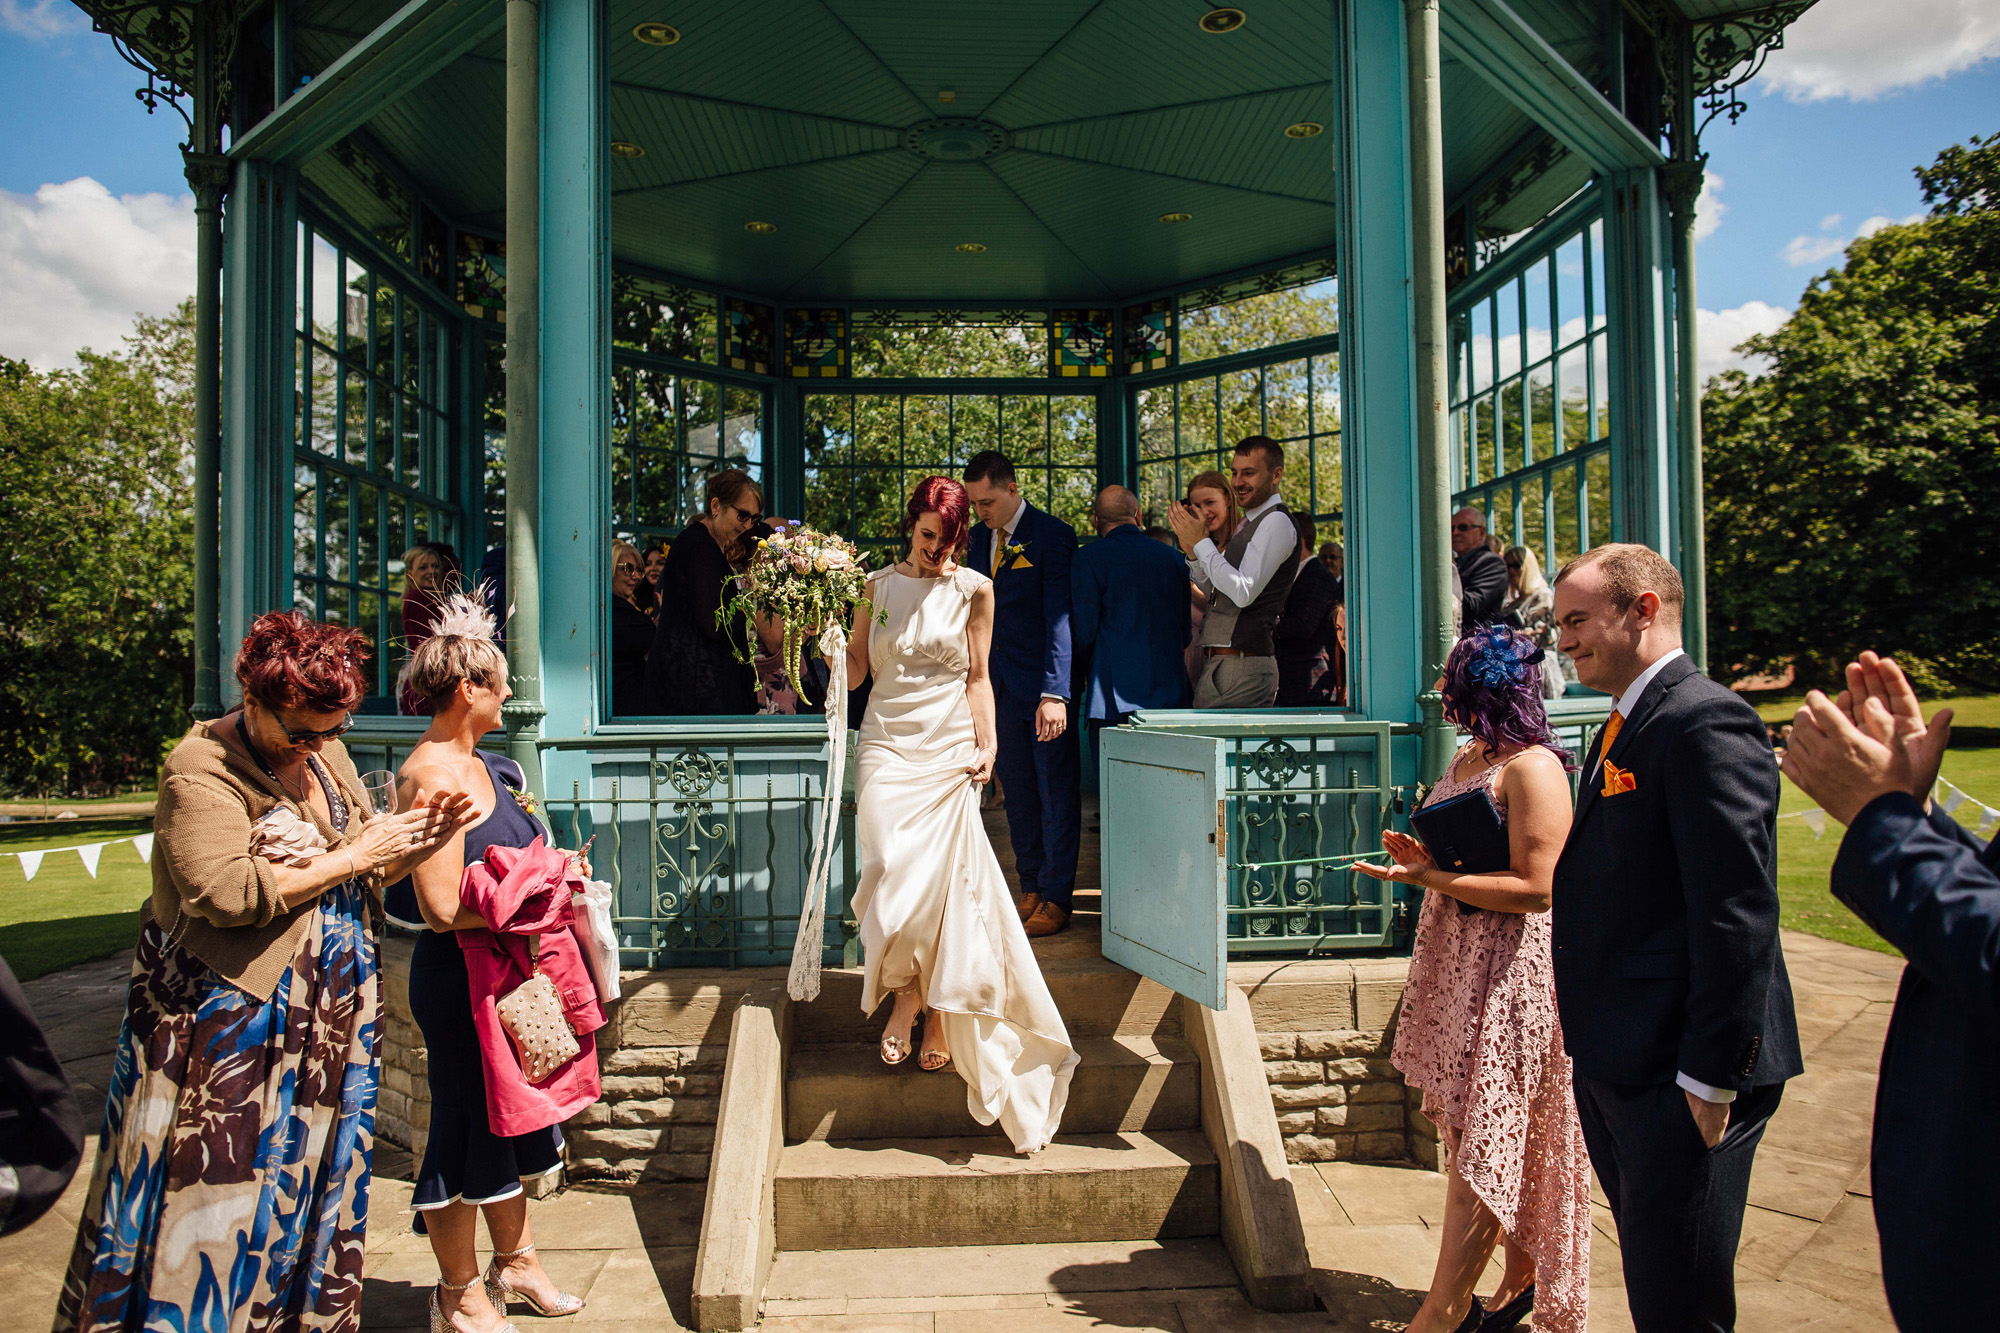 Sarah-Honeysuckle-Bias-Cut-Silk-Vintage-Inspired-Wedding-Gown-Sheffield-Wedding-Kate-Beaumont-22.jpg